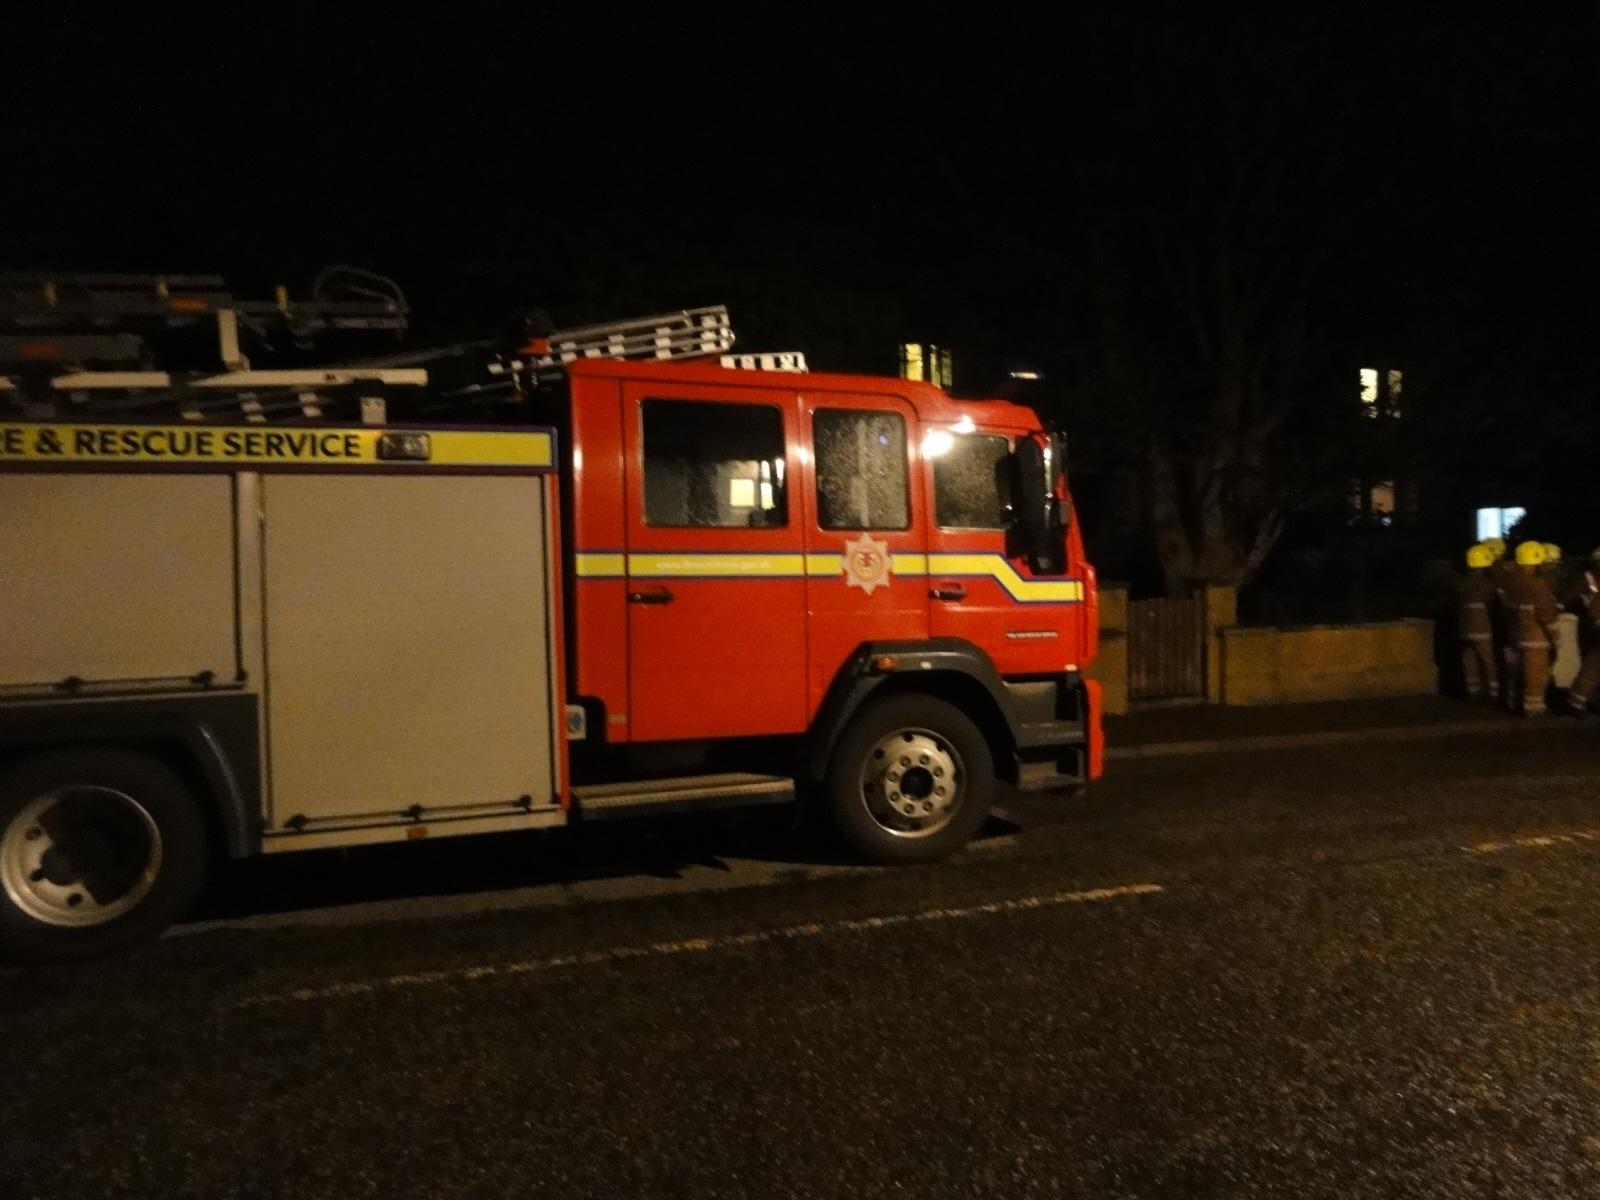 A woman was taken to Western Isles Hospital following the fire